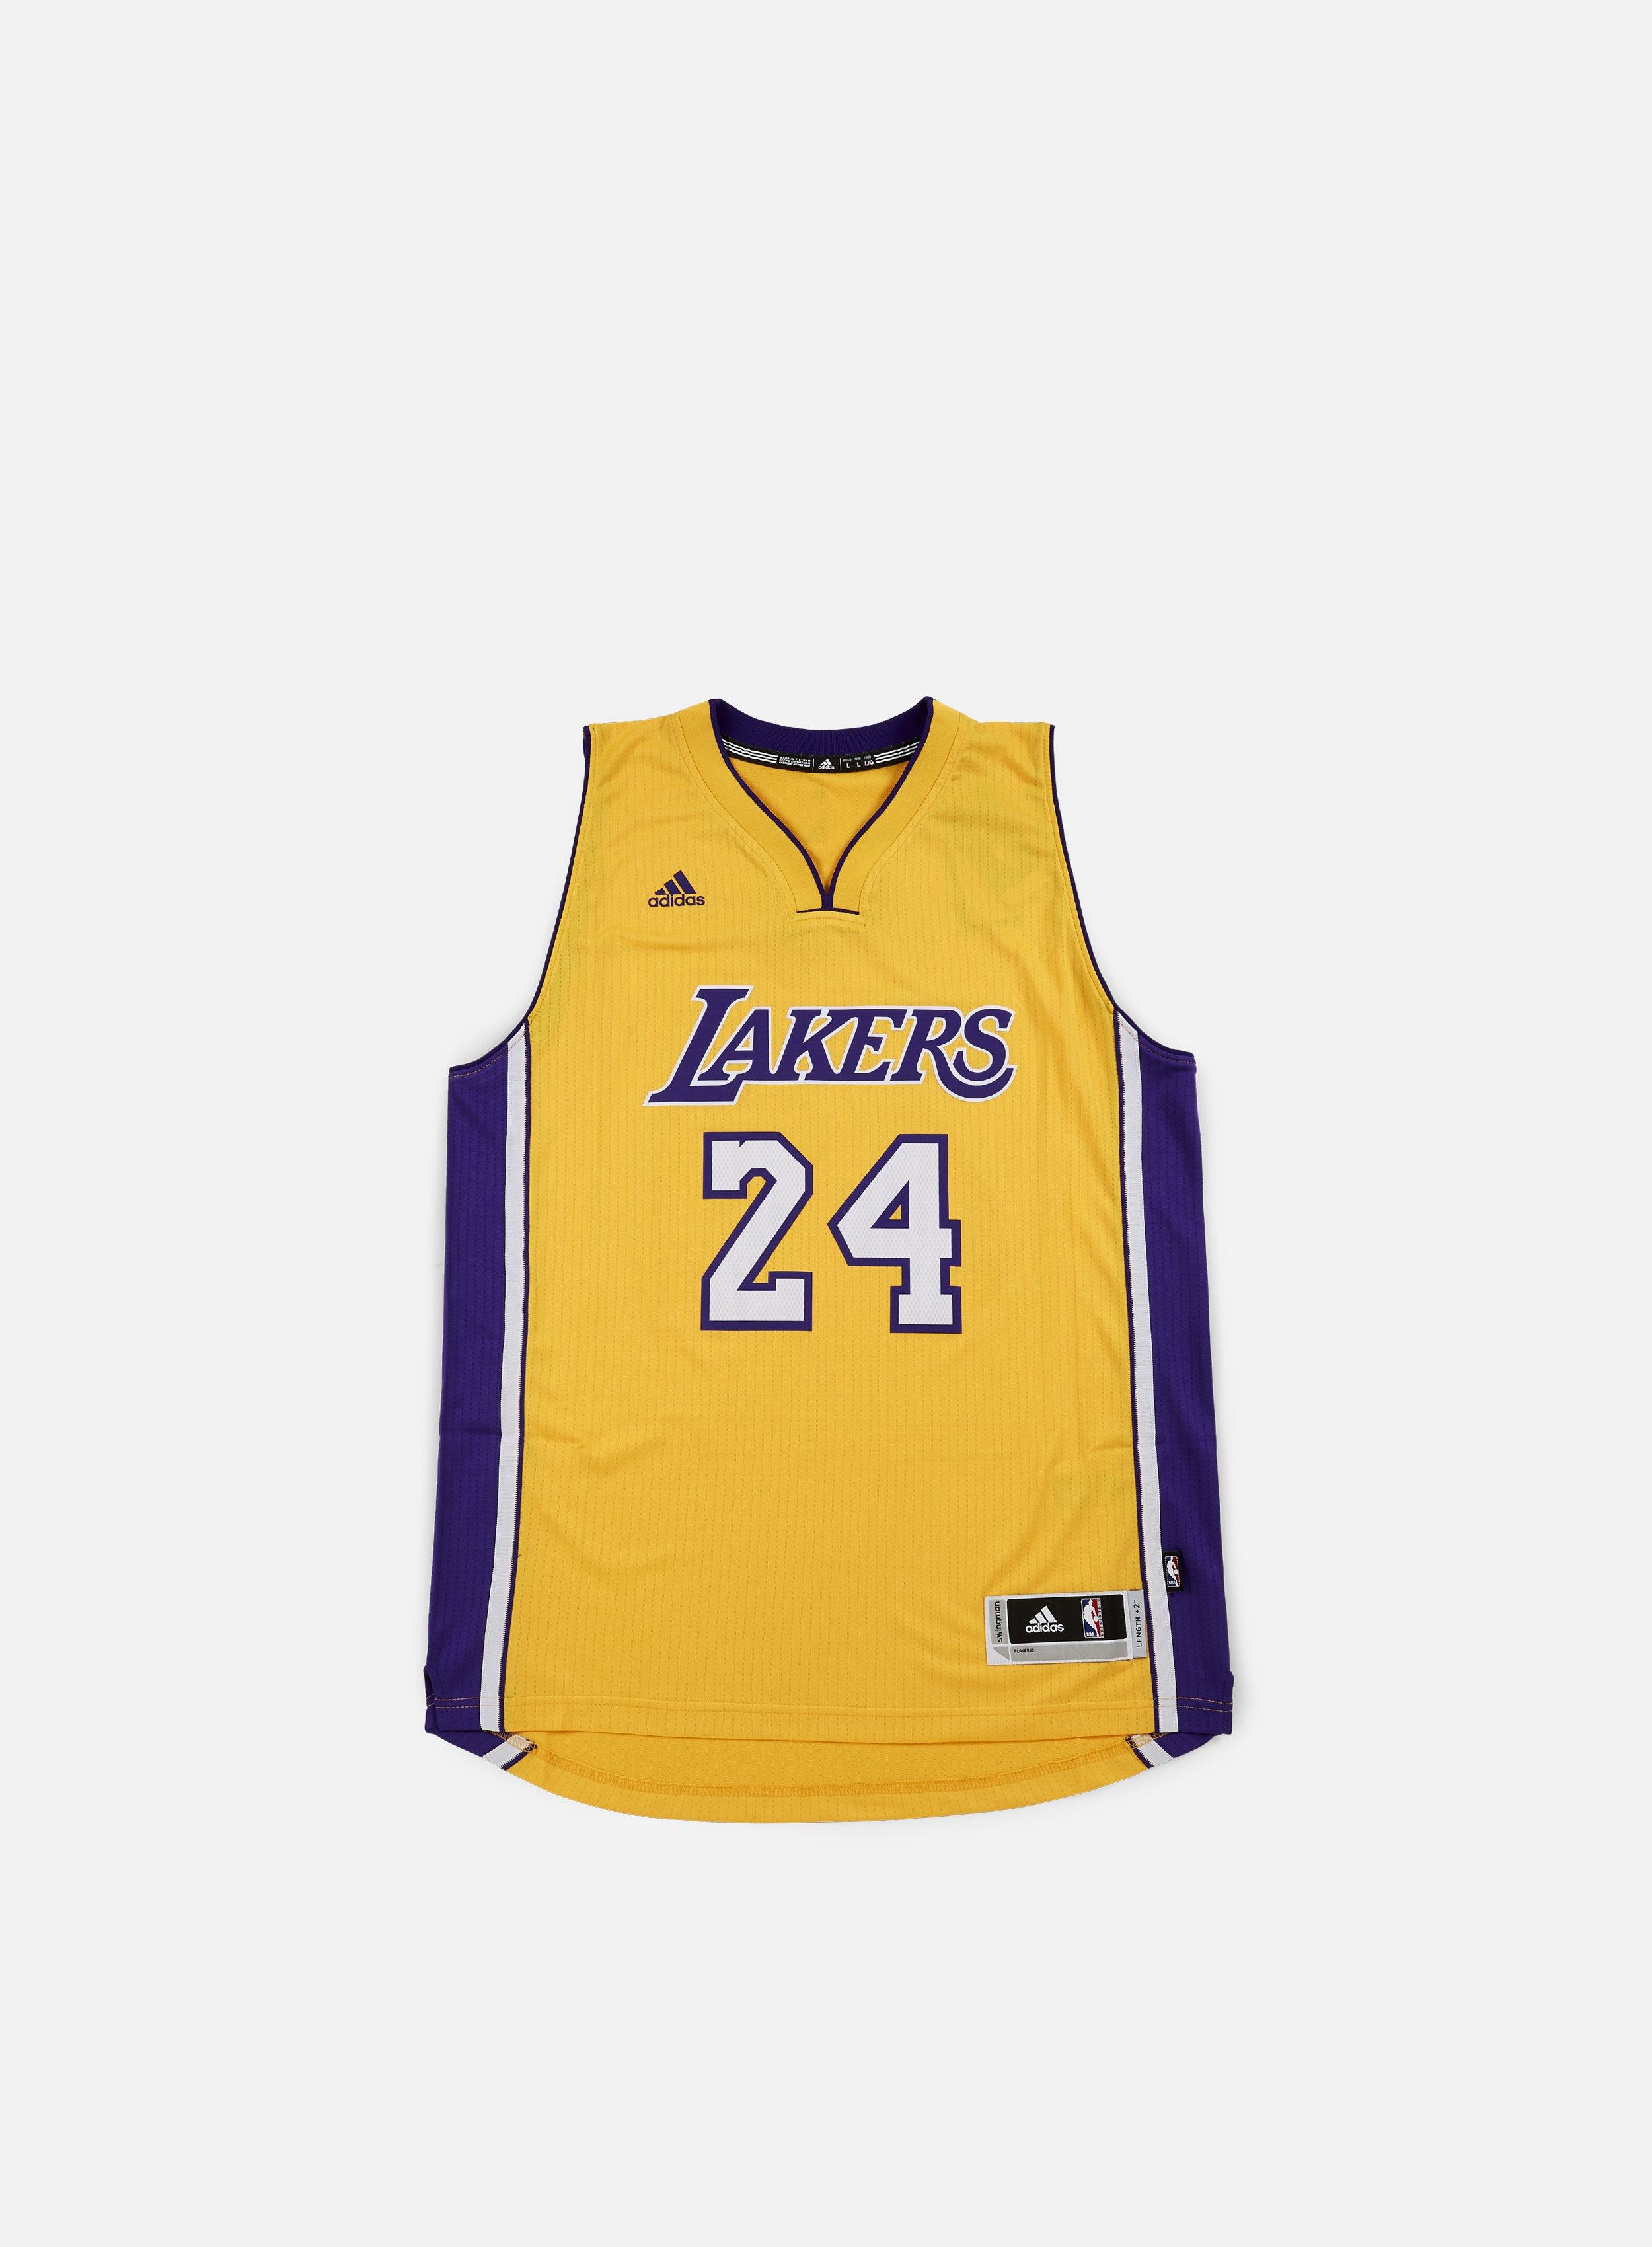 LA Lakers Swingman Jersey Kobe Bryant